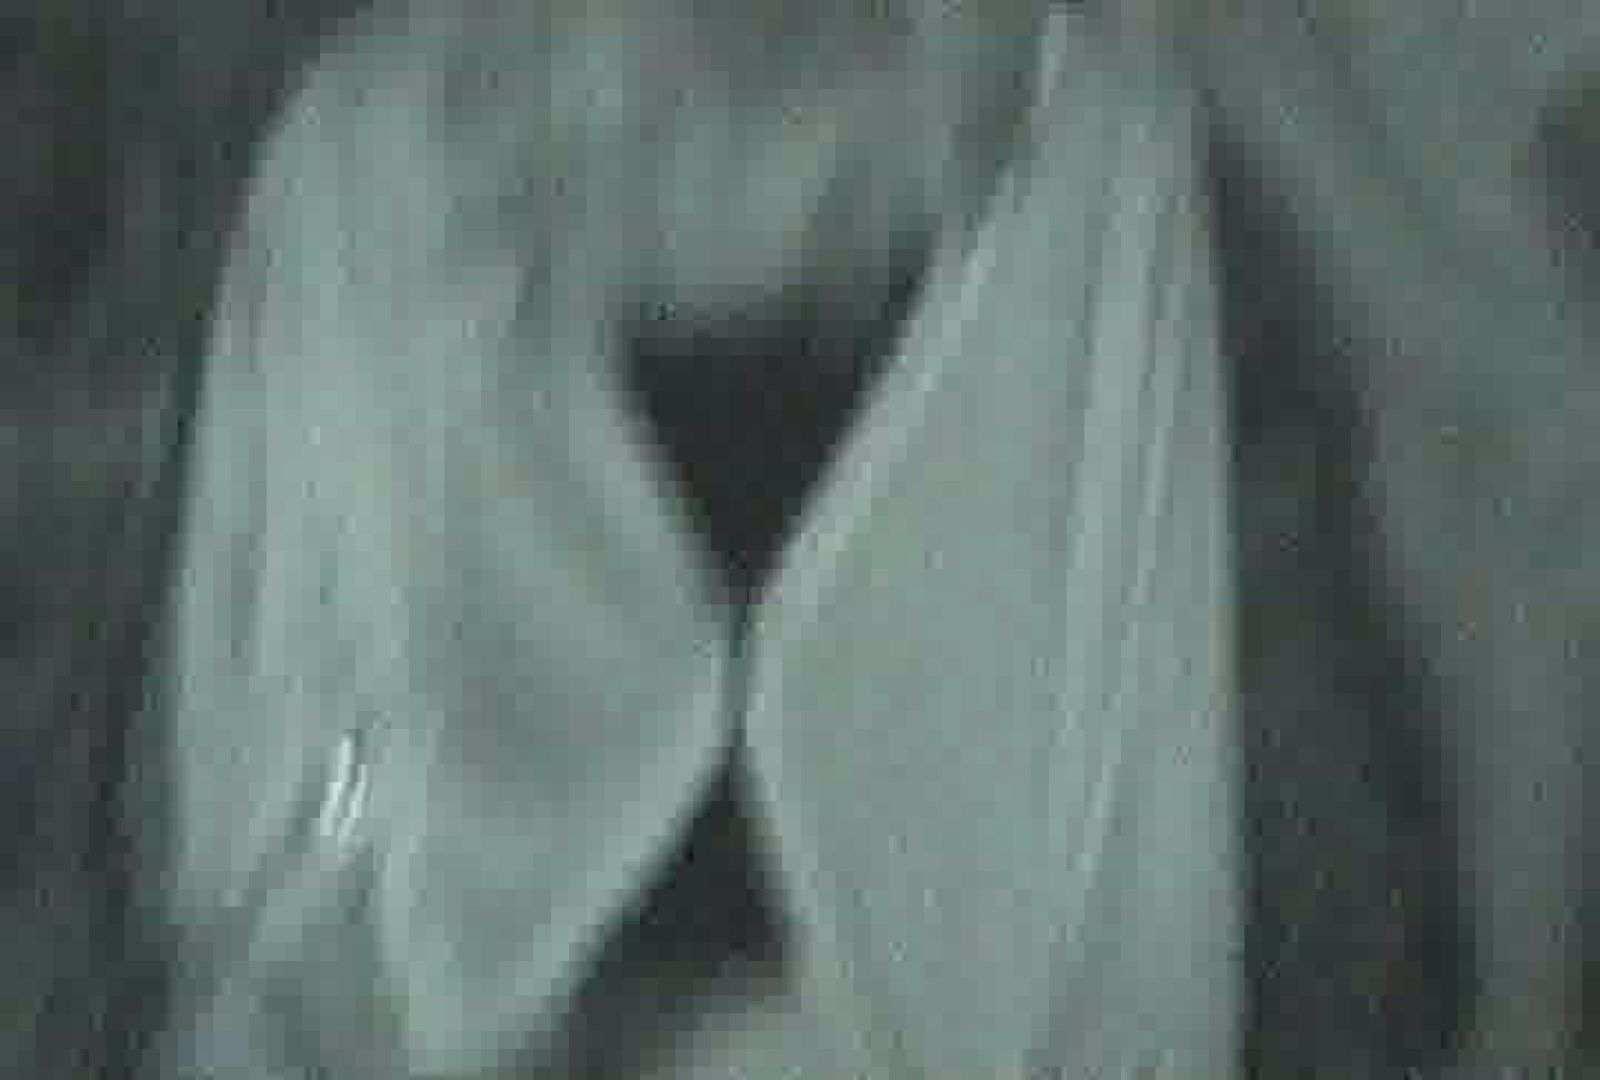 充血監督の深夜の運動会Vol.92 野外 性交動画流出 97pic 87